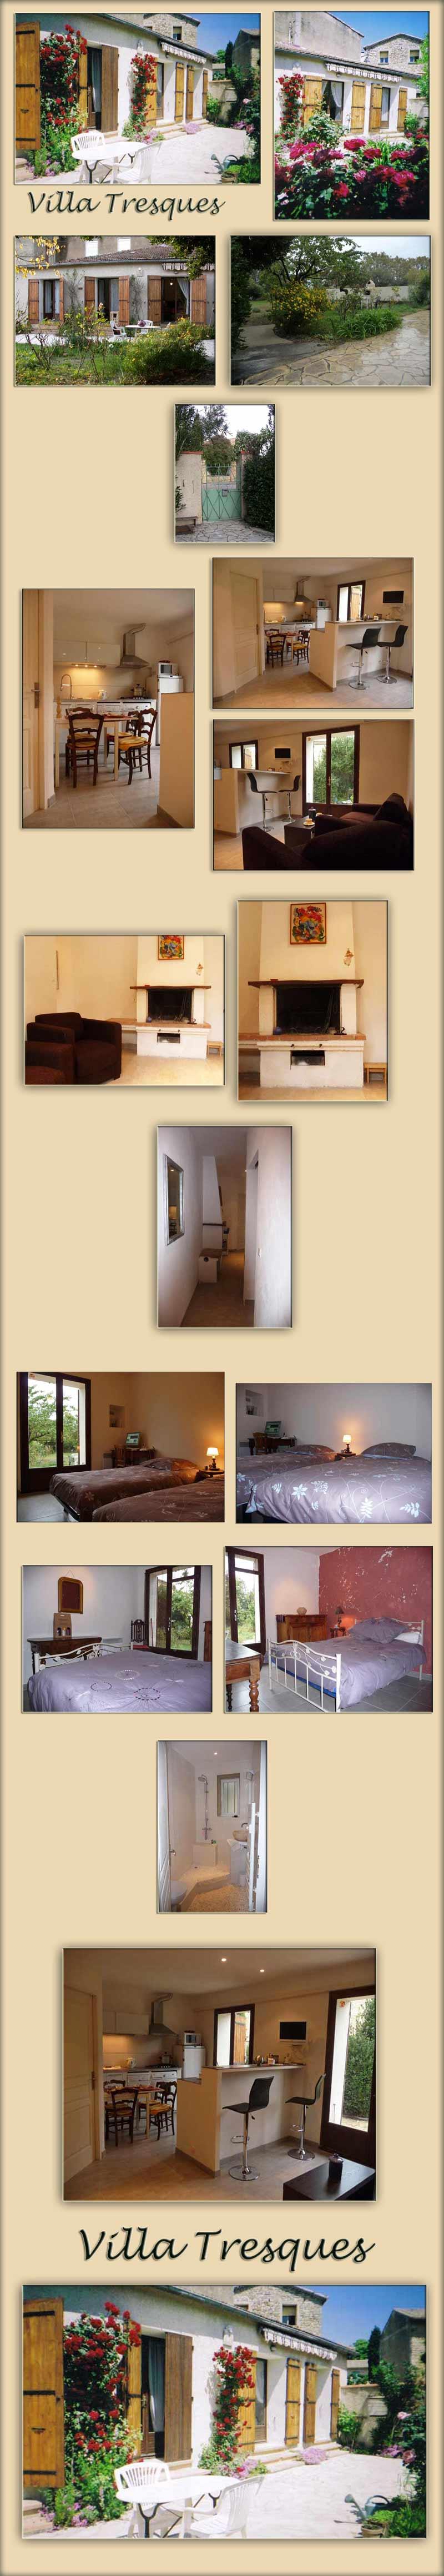 French village villa rental, Tresques, Gard - large photos